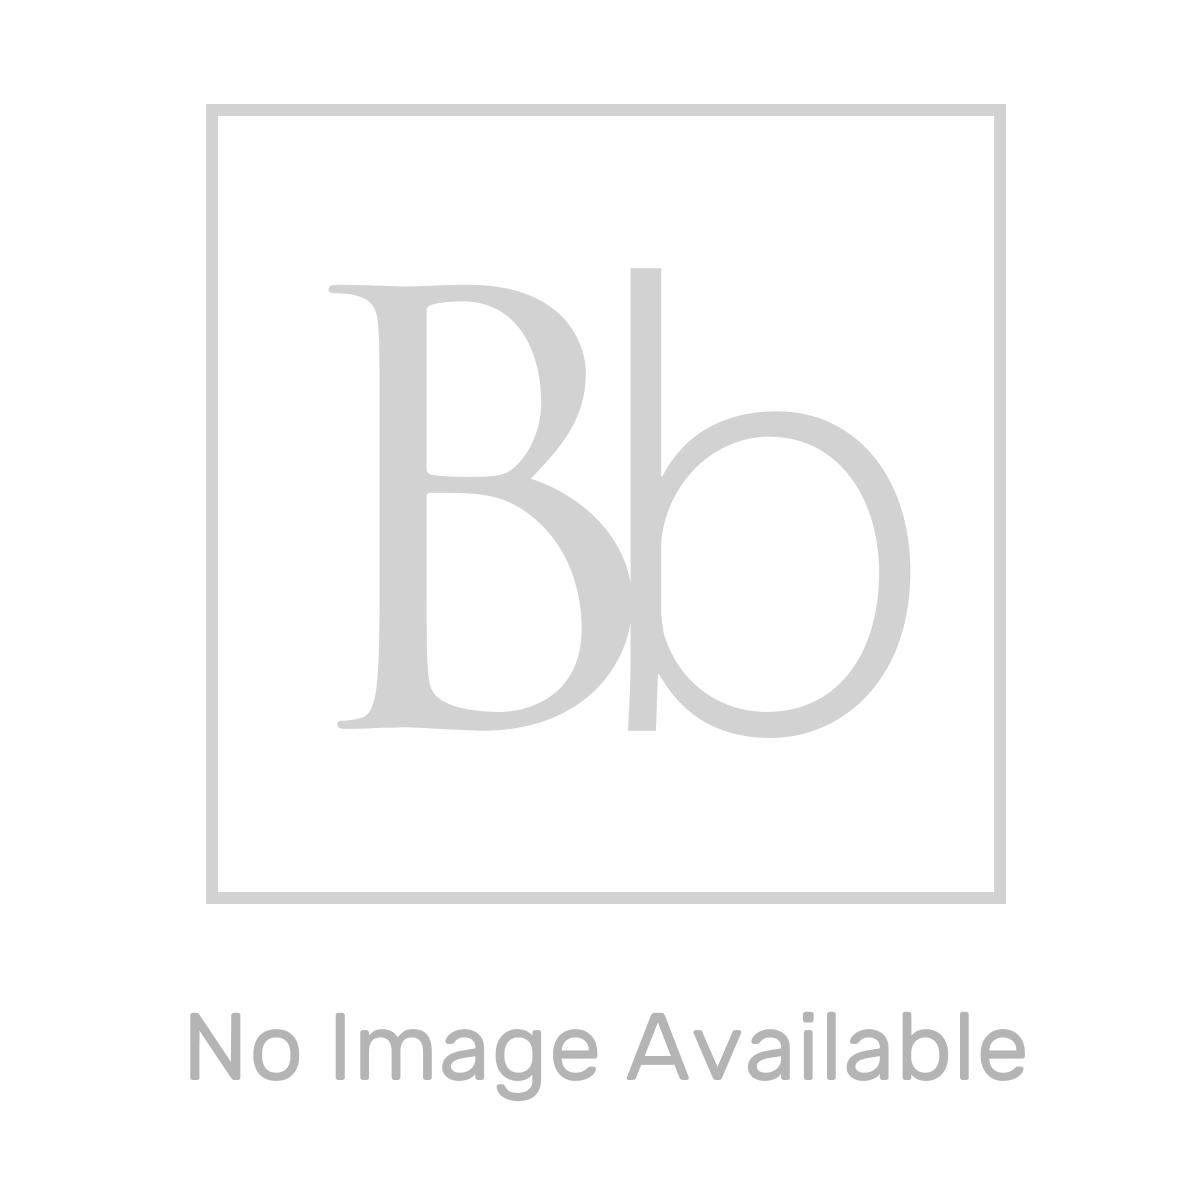 Stuart Turner 46500 Showermate Eco Standard Twin 2.0 Bar Pump Right